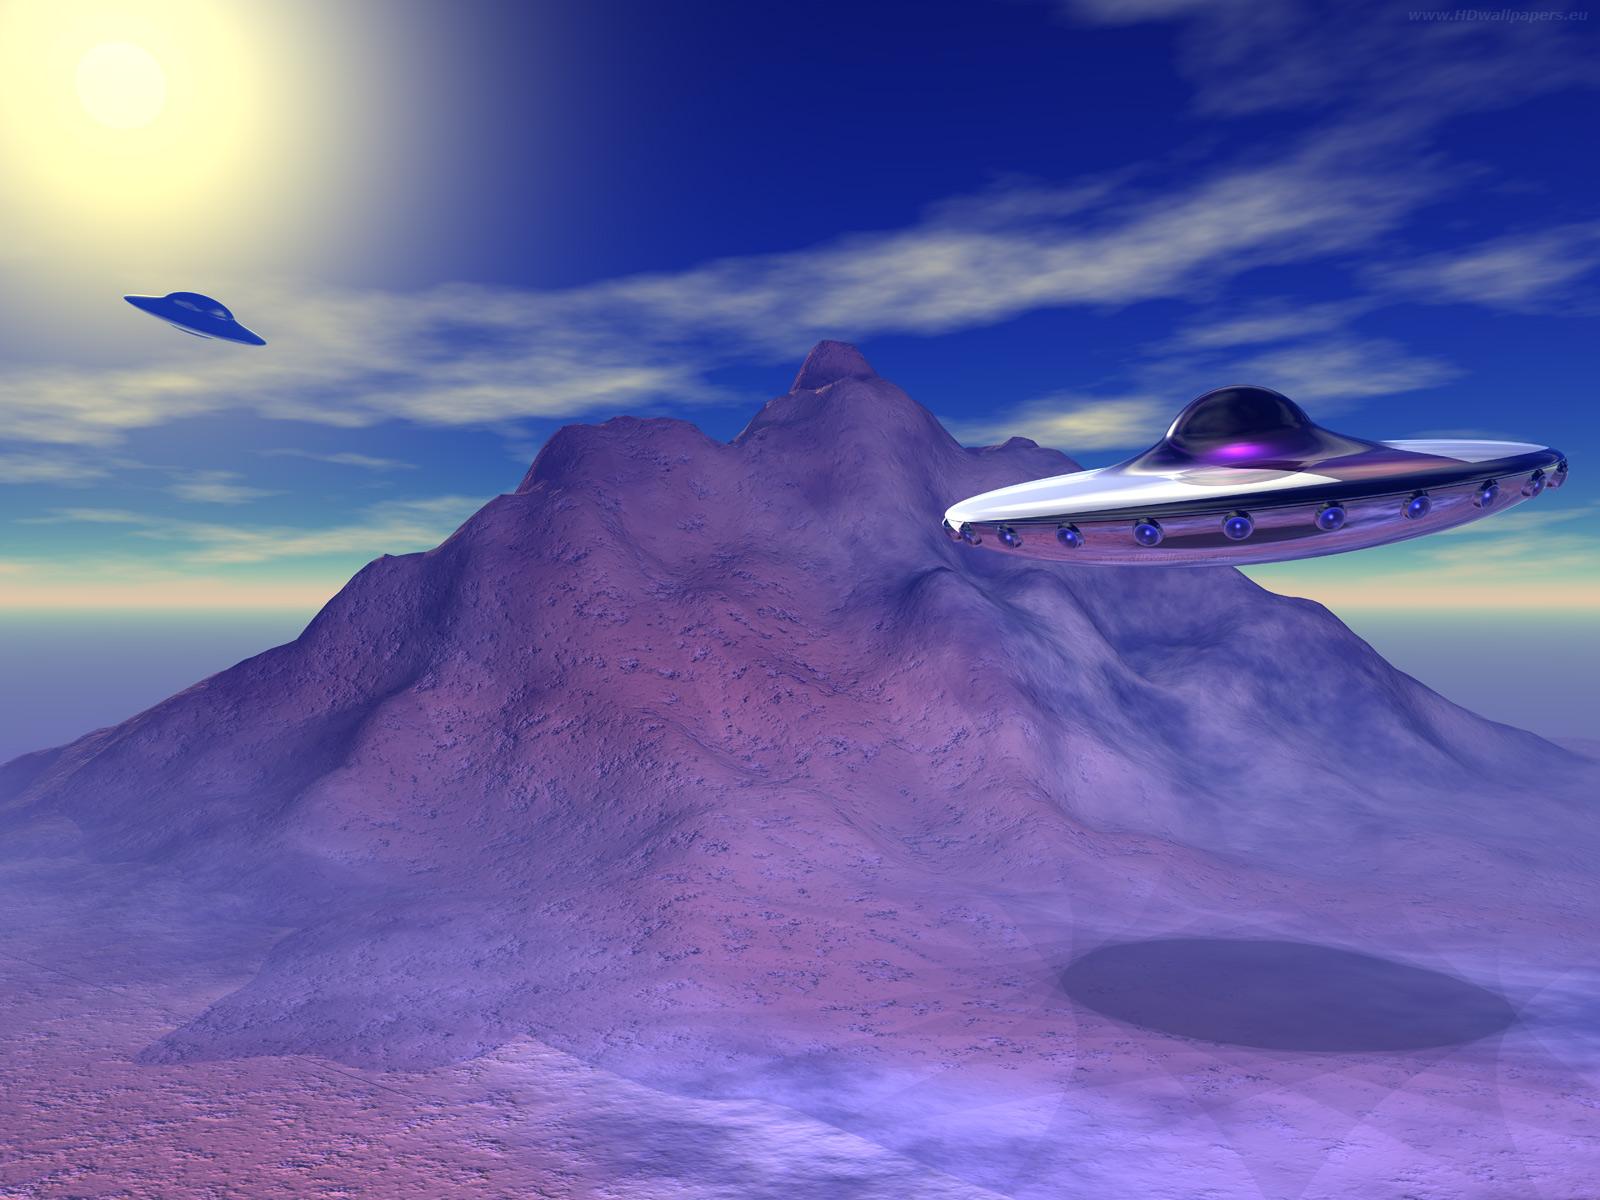 http://wallpapers.designdistributor.com/wallpaper/HD-wallpapers-UFO-clasic2-1600x1200.jpg